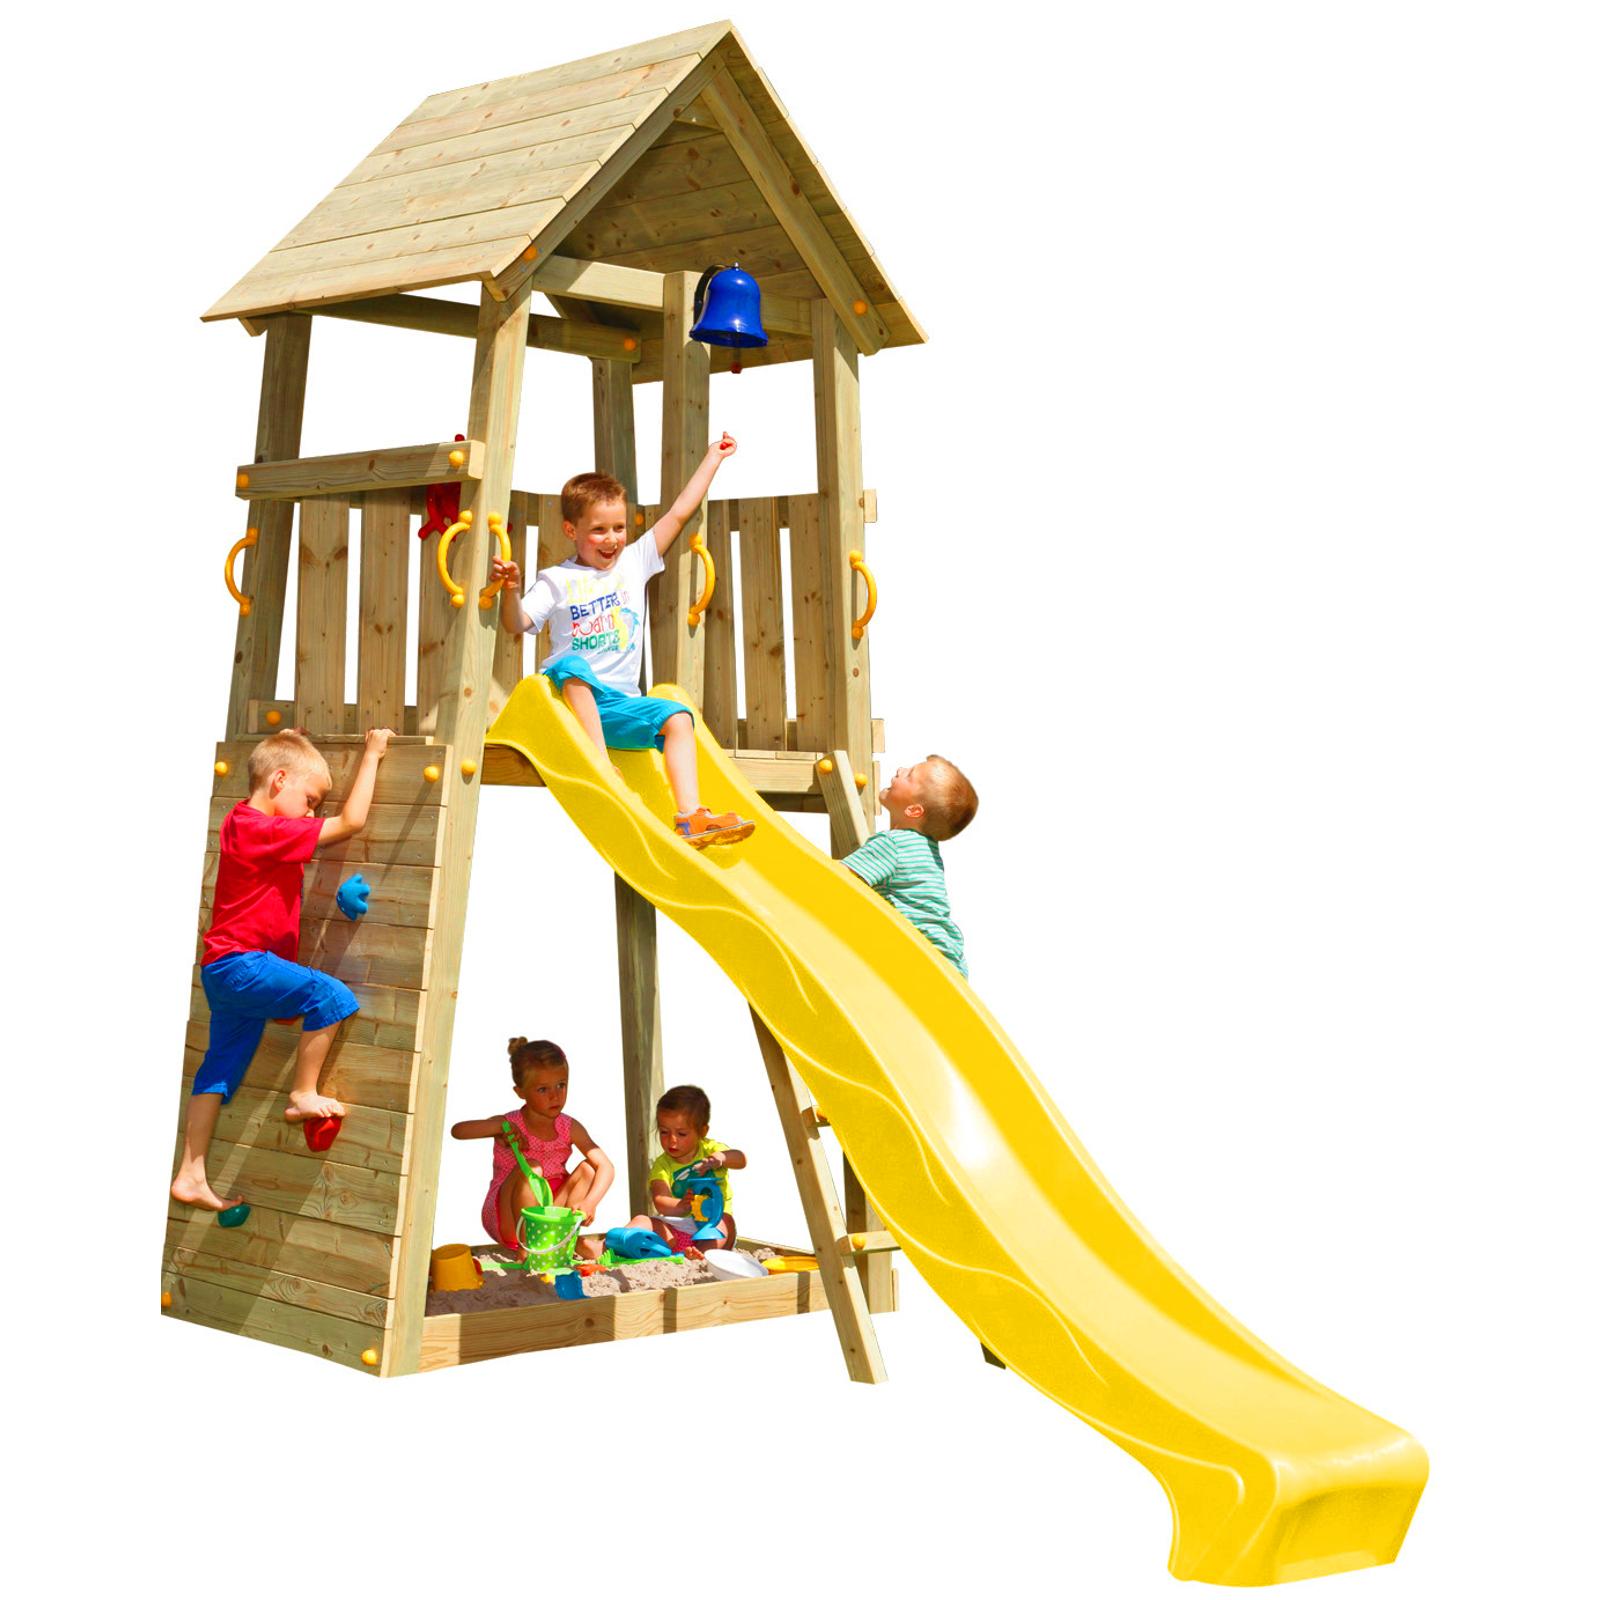 blue rabbit spielturm belvedere mit rutsche kletterturm. Black Bedroom Furniture Sets. Home Design Ideas